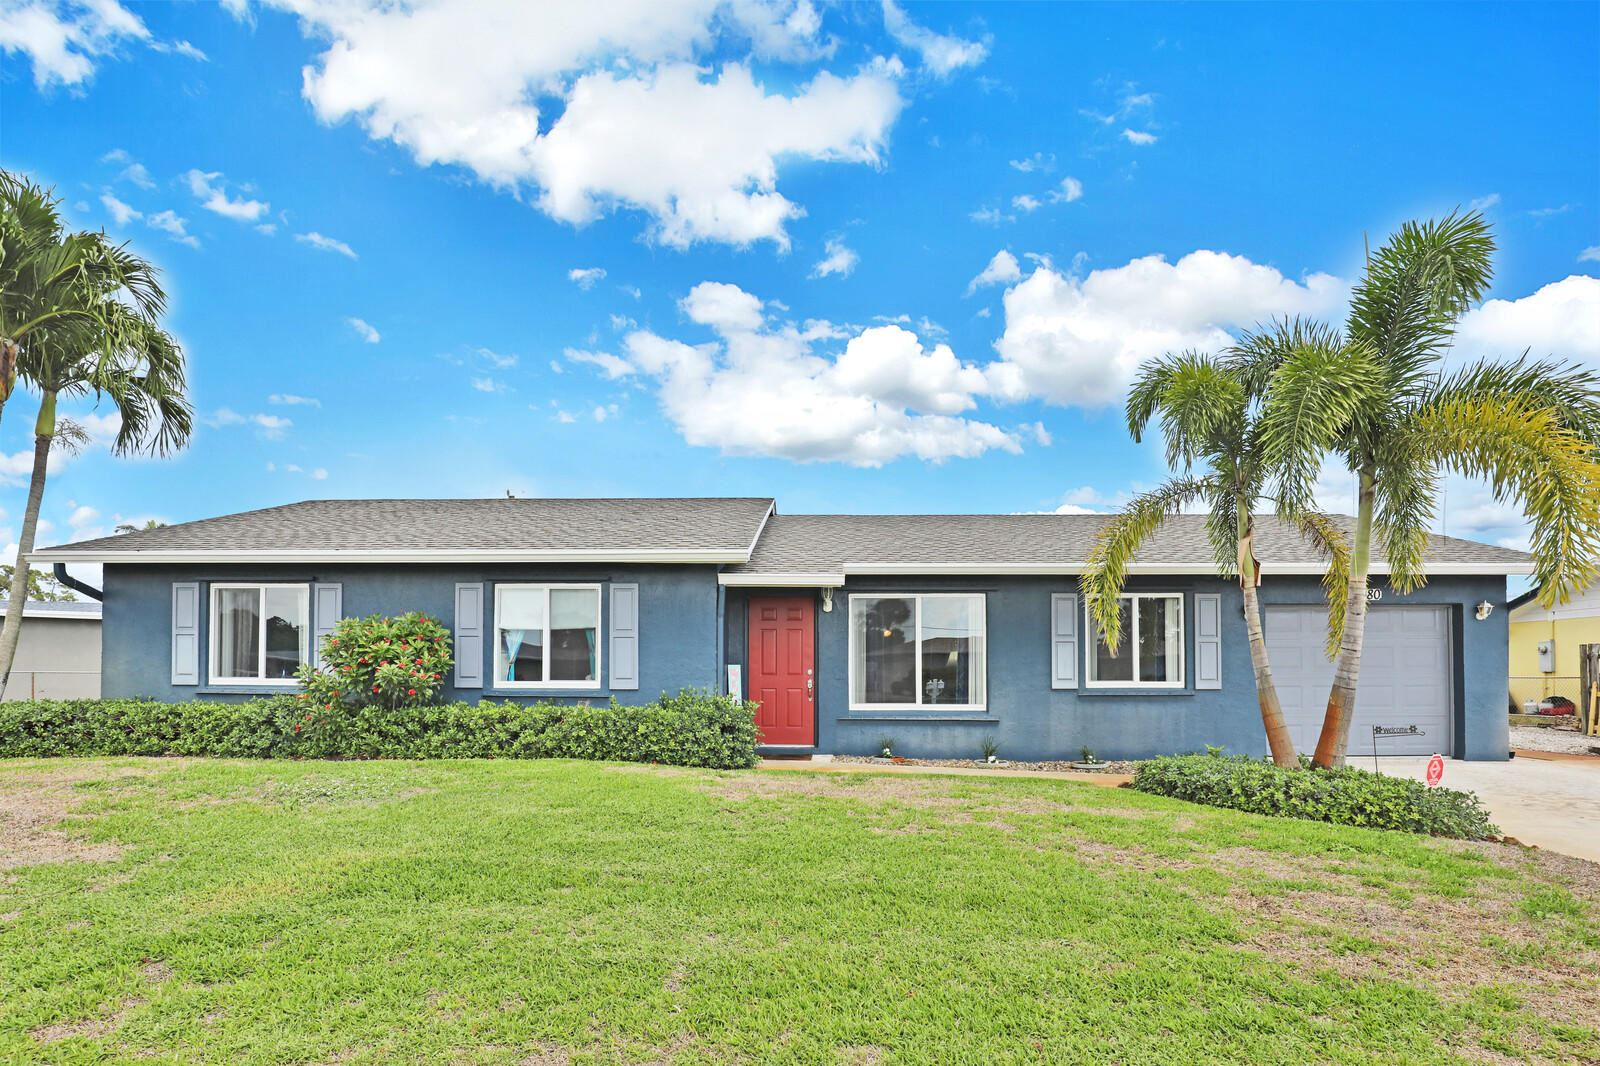 Photo of 3080 Medinah Circle W, Lake Worth, FL 33467 (MLS # RX-10714470)